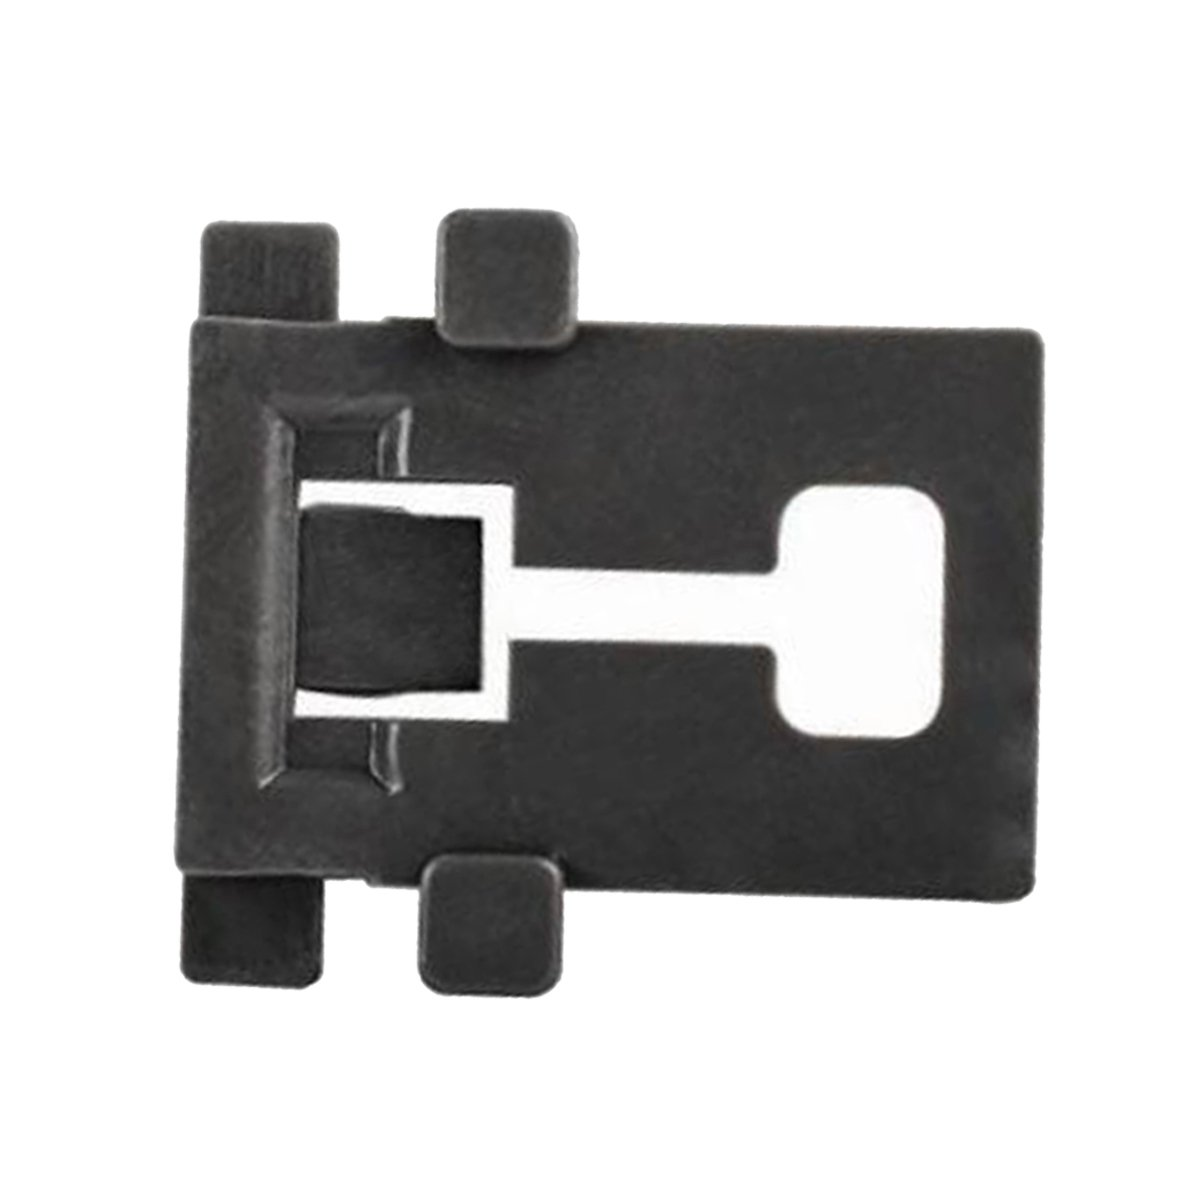 lonye w10195840 Dishwasher Positioner for Whirlpool Kenmore食洗機ラックアジャスターps3407016   B0779699R9